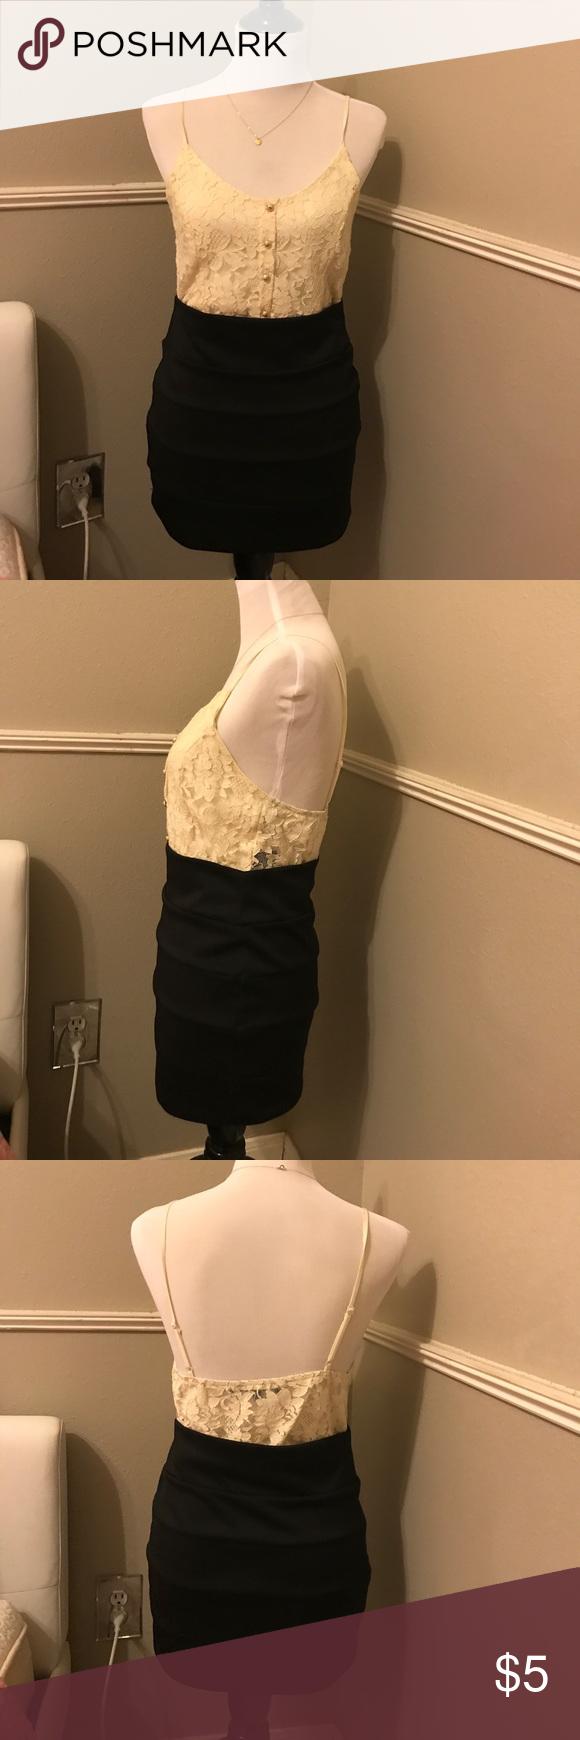 Black Mini Skirt (skirt only) Black mini skirt a'gaci Skirts Mini